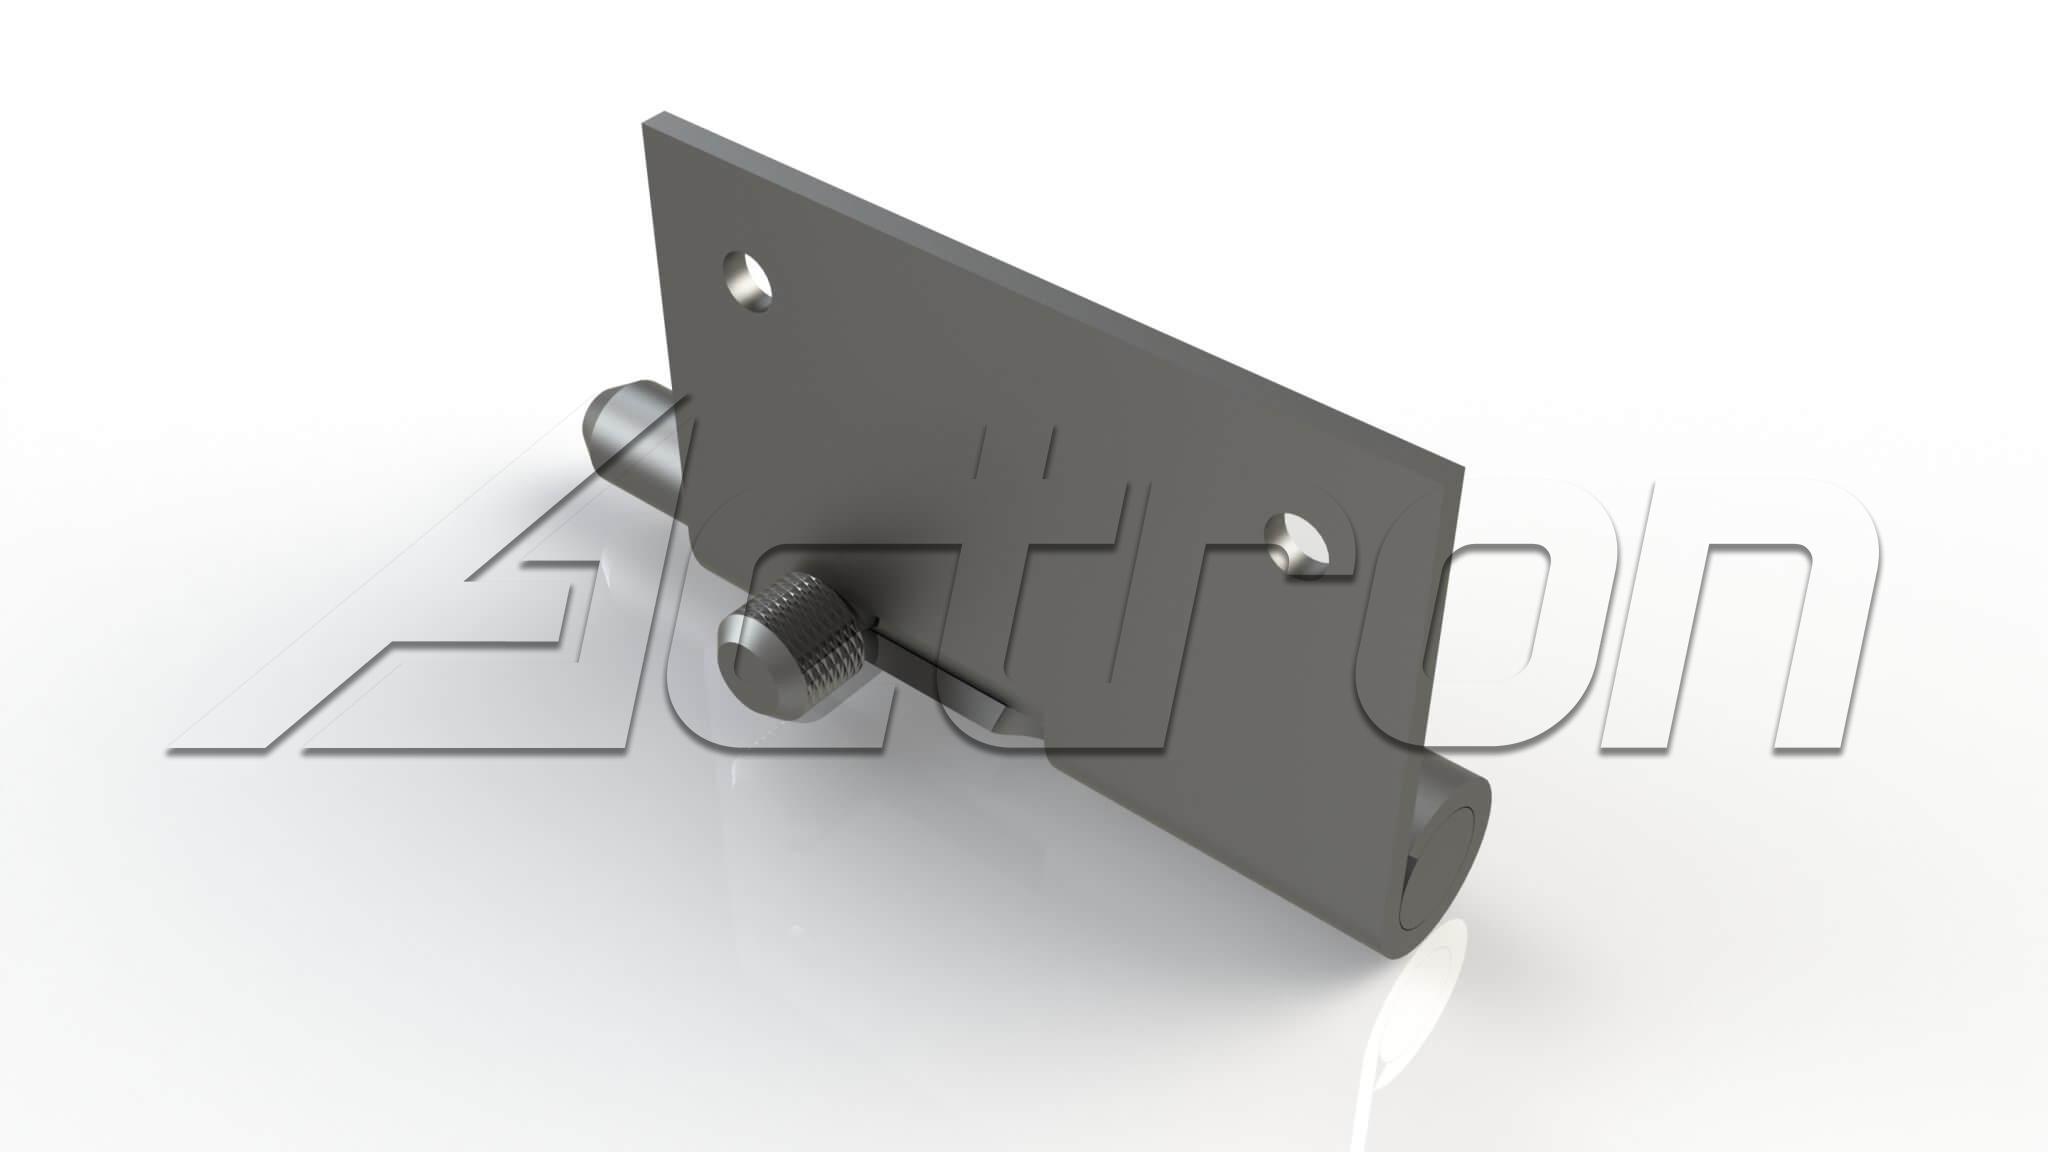 latch-8211-hinge-assy-5053-a2068.jpg